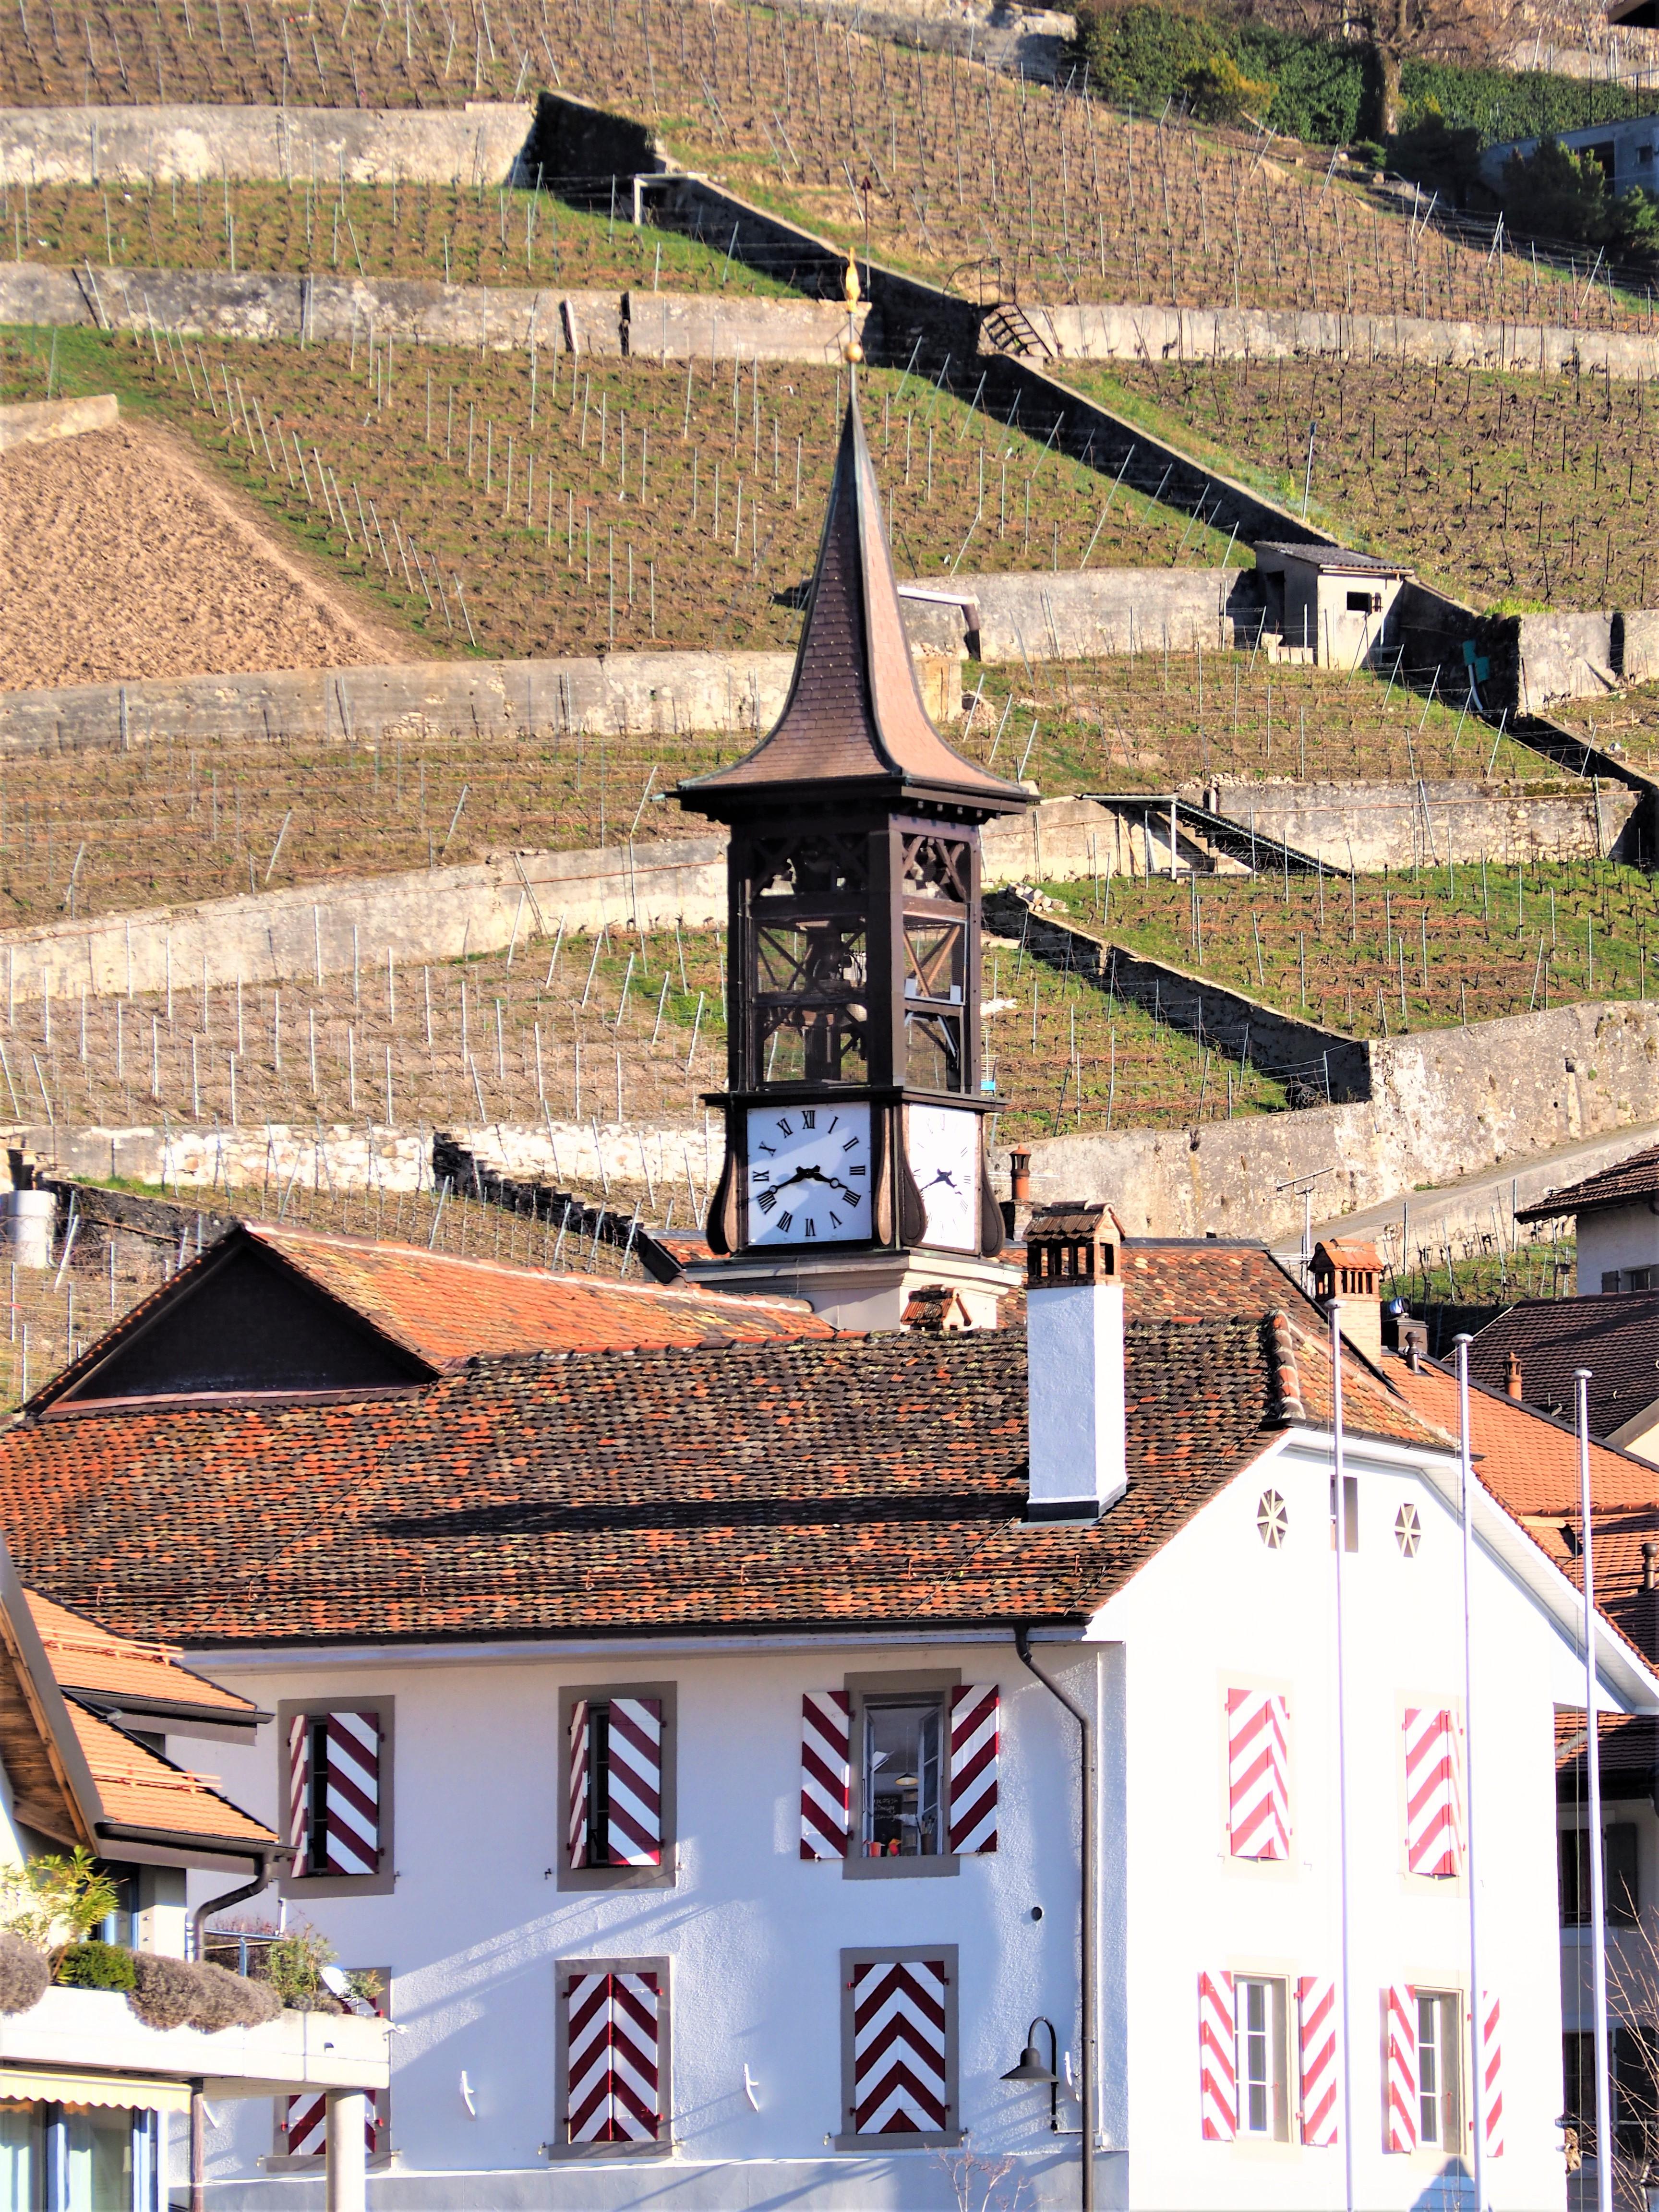 Aran-Clioandco-blog-voyage-lausanne-suisse-canton-de-vaud-vignoble-de-Lavaux-balade